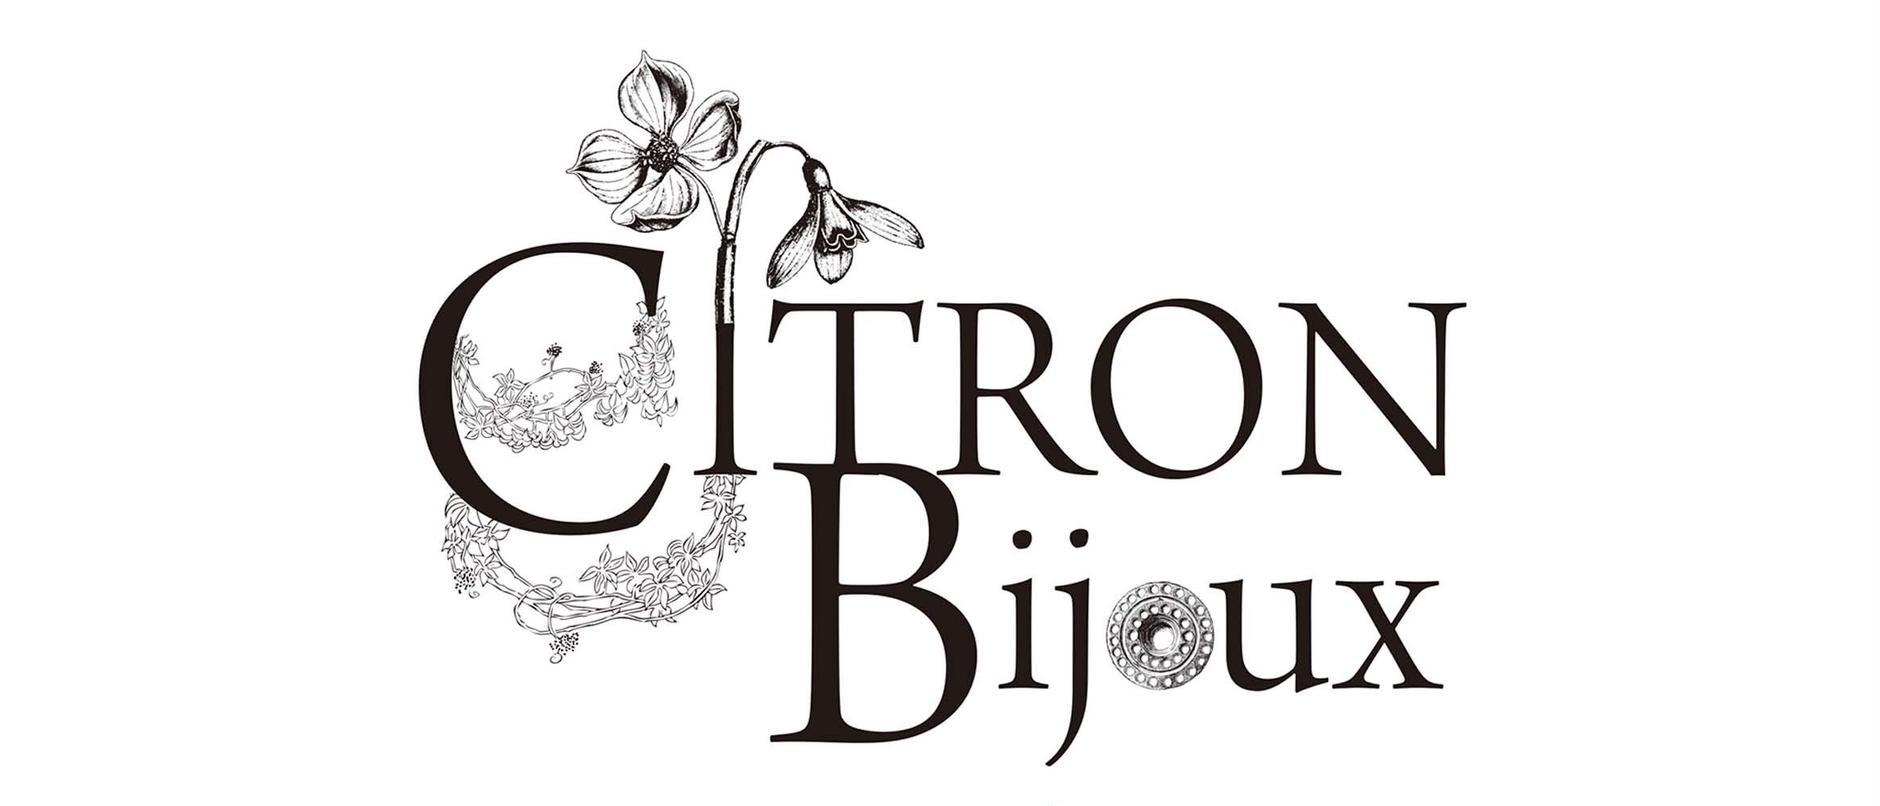 CITRON Bijoux online store